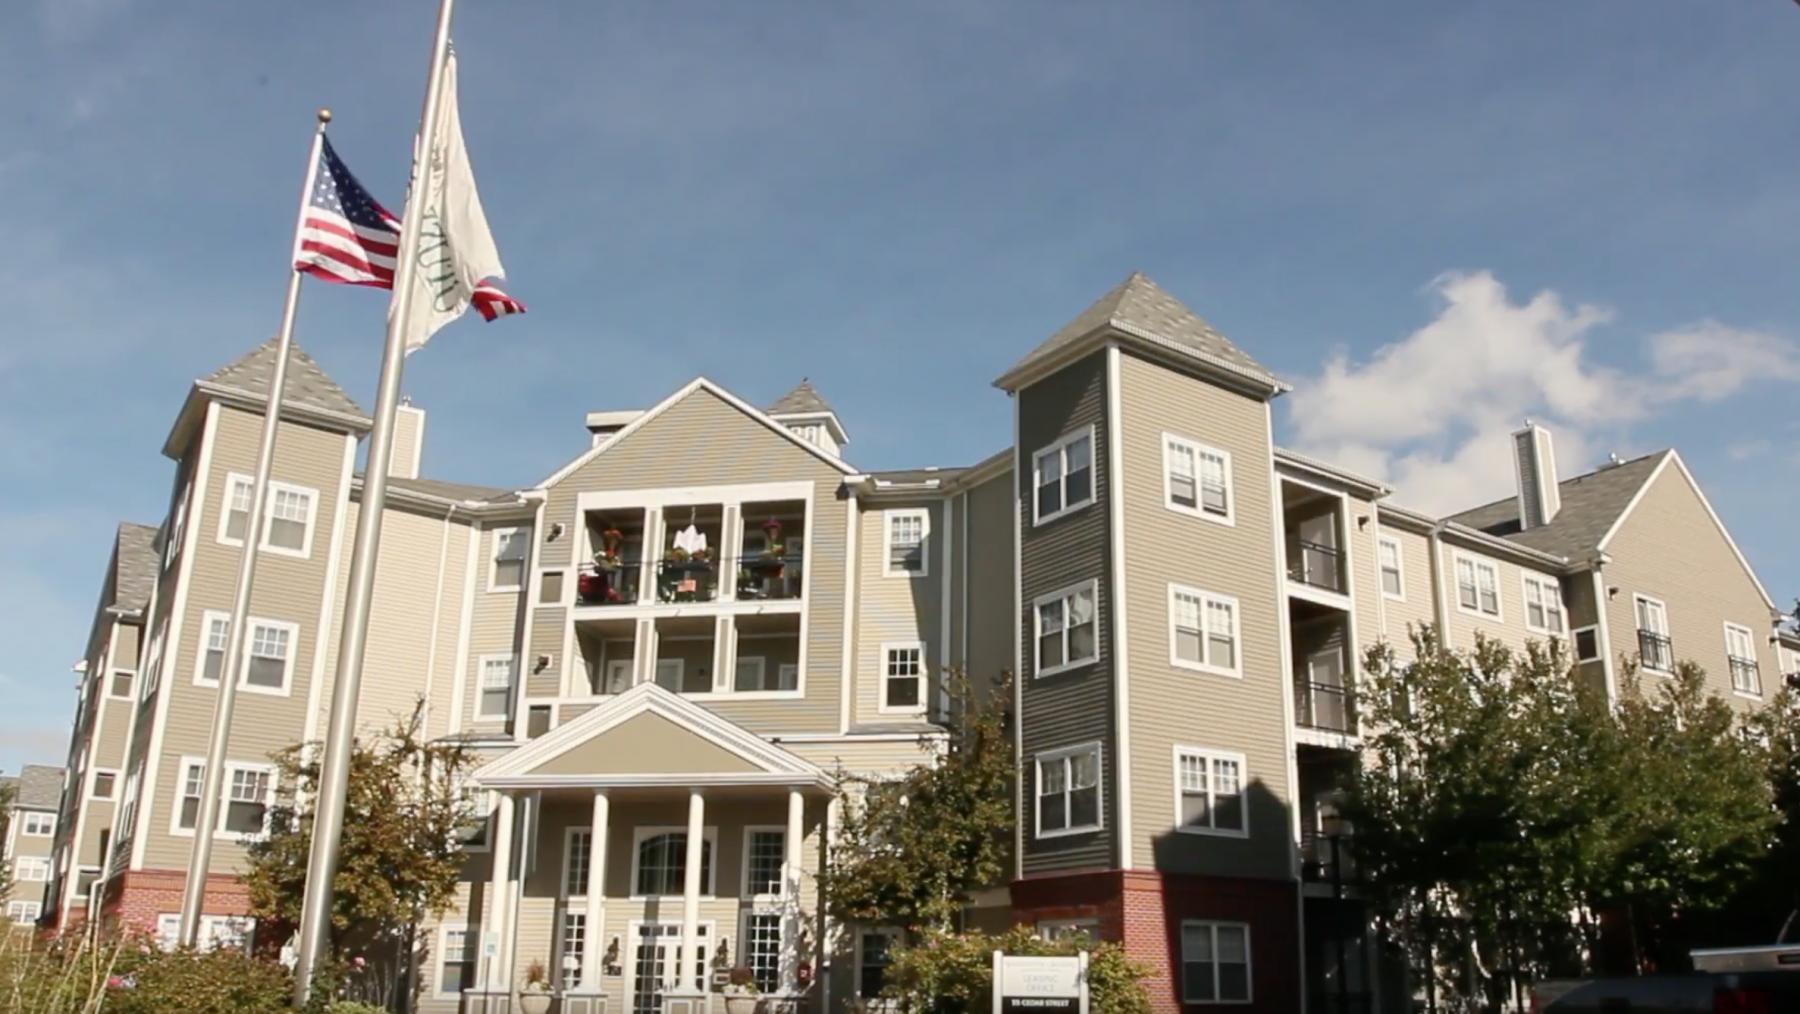 1 - Clubhouse & Apartment Bldg